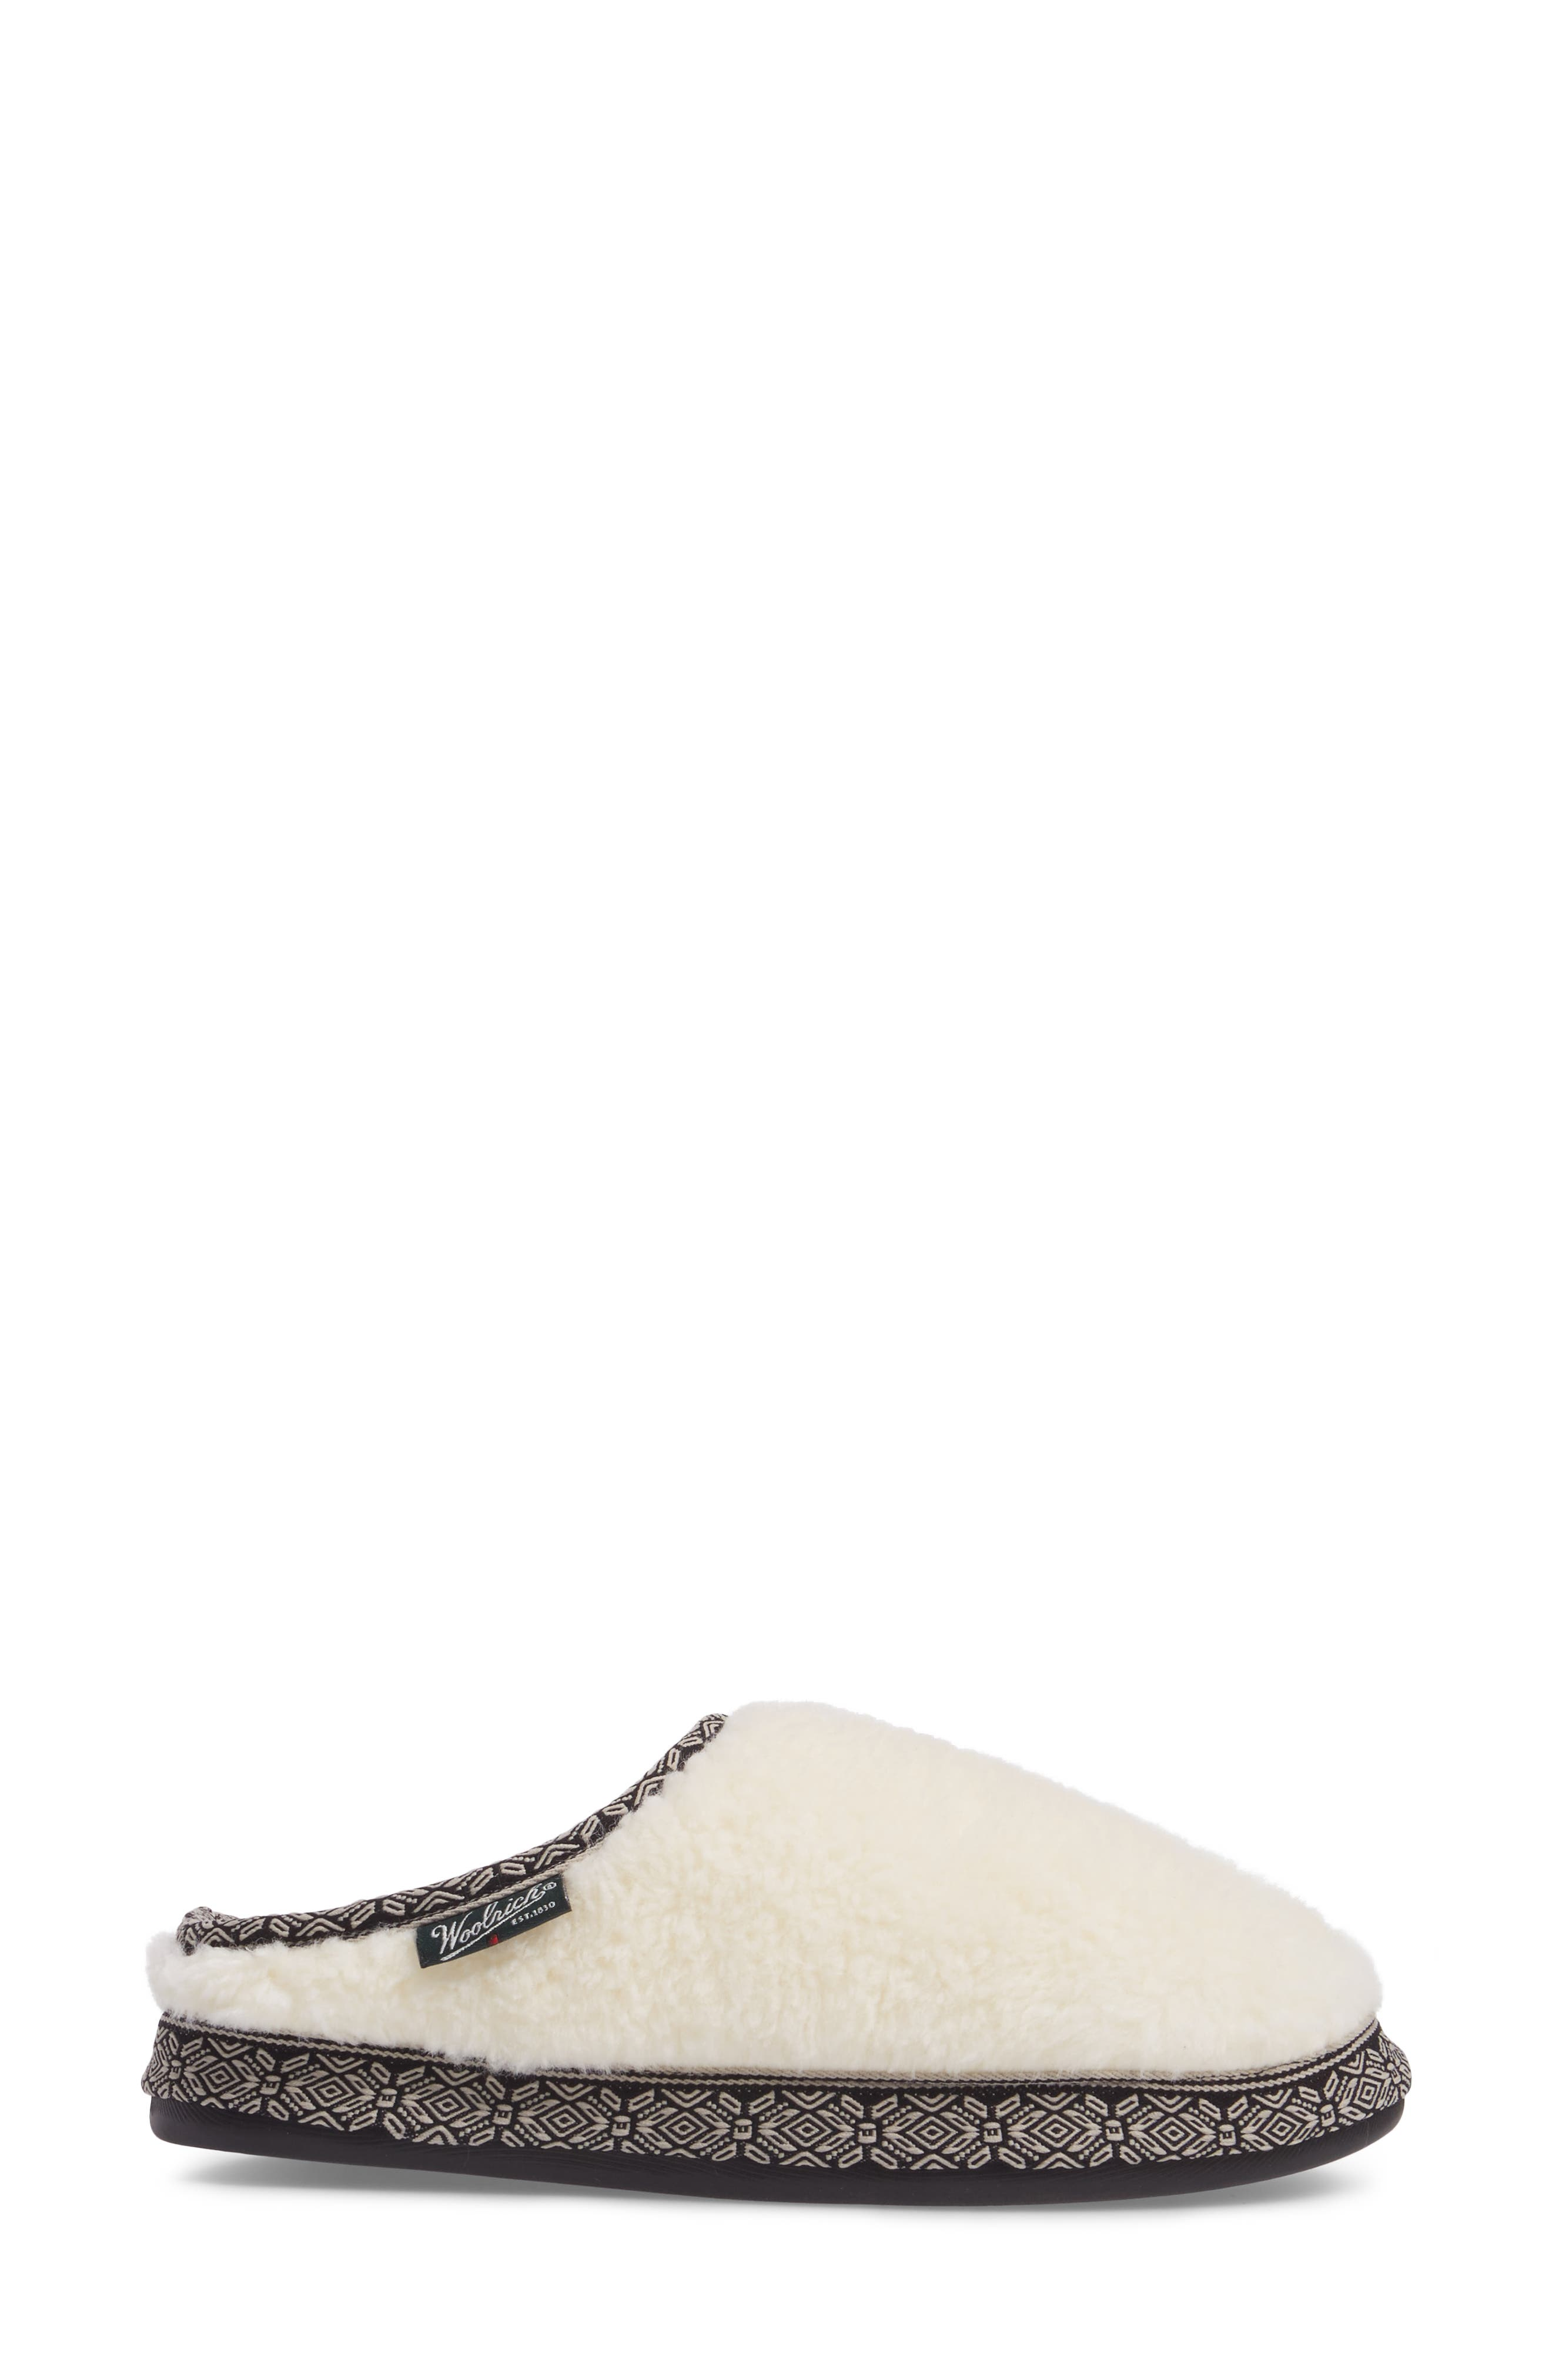 Whitecap Mule Slipper,                             Alternate thumbnail 8, color,